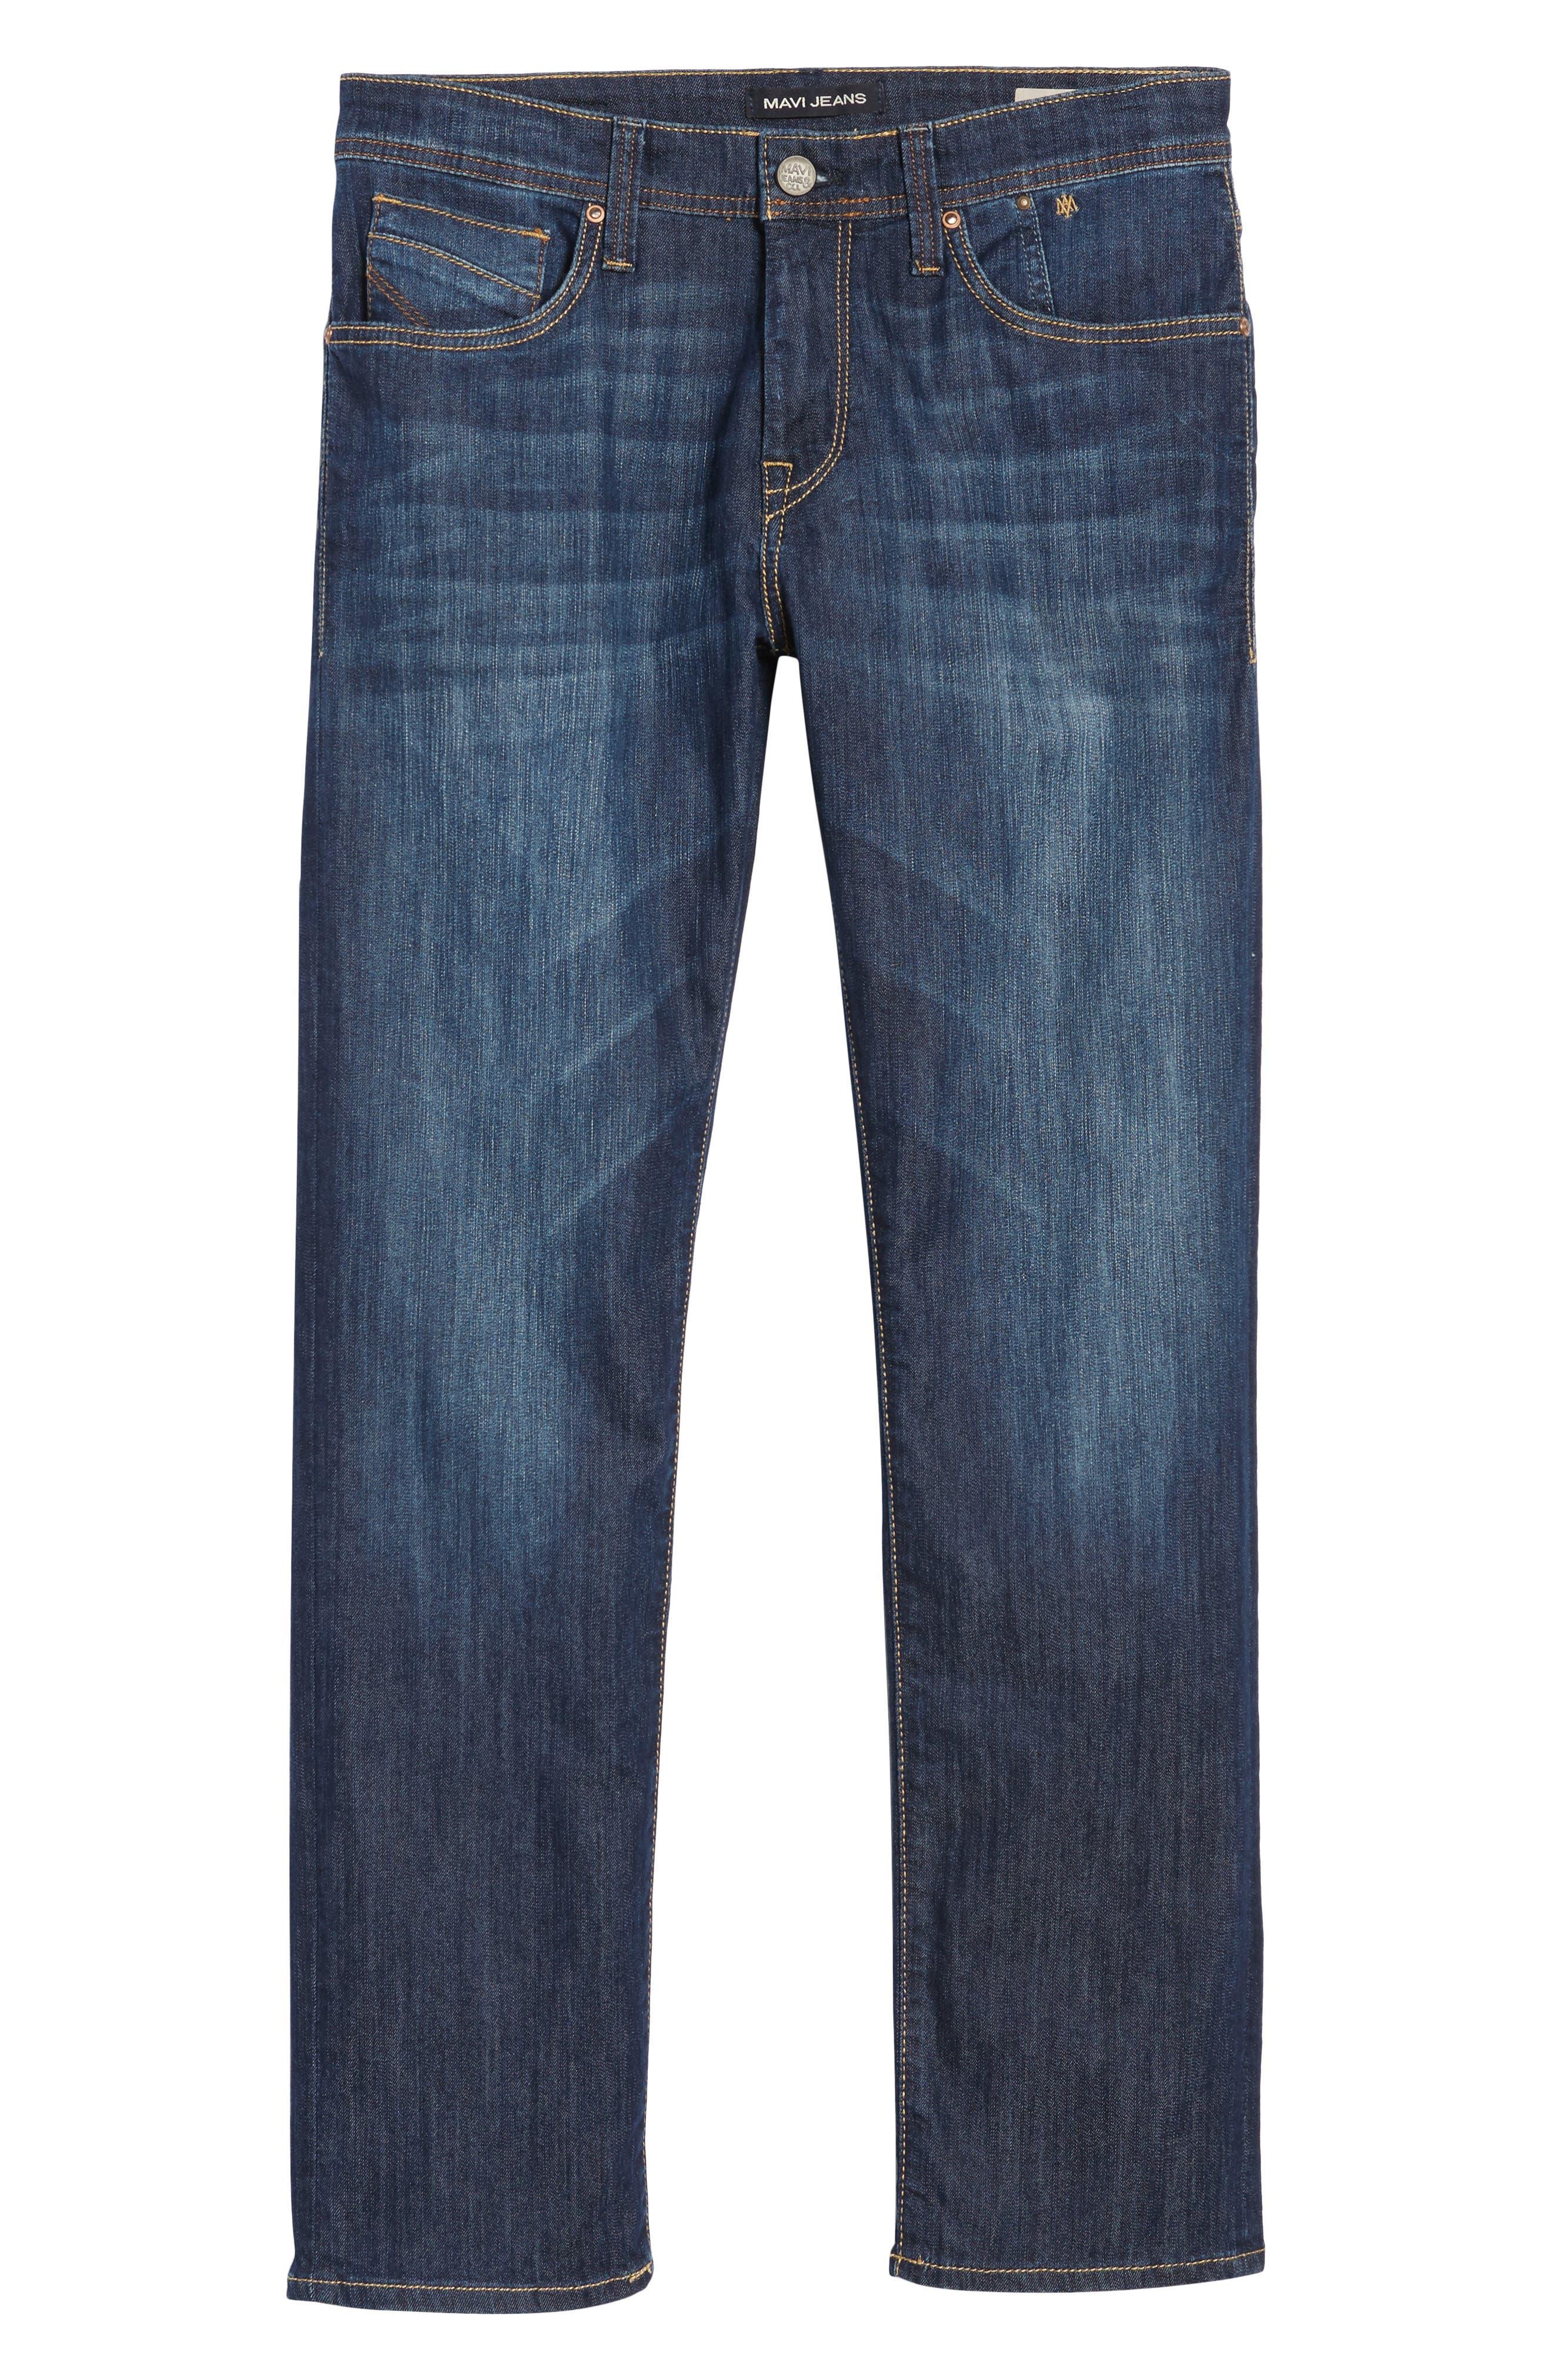 MAVI JEANS, Zach Straight Leg Jeans, Alternate thumbnail 7, color, DARK MAUI